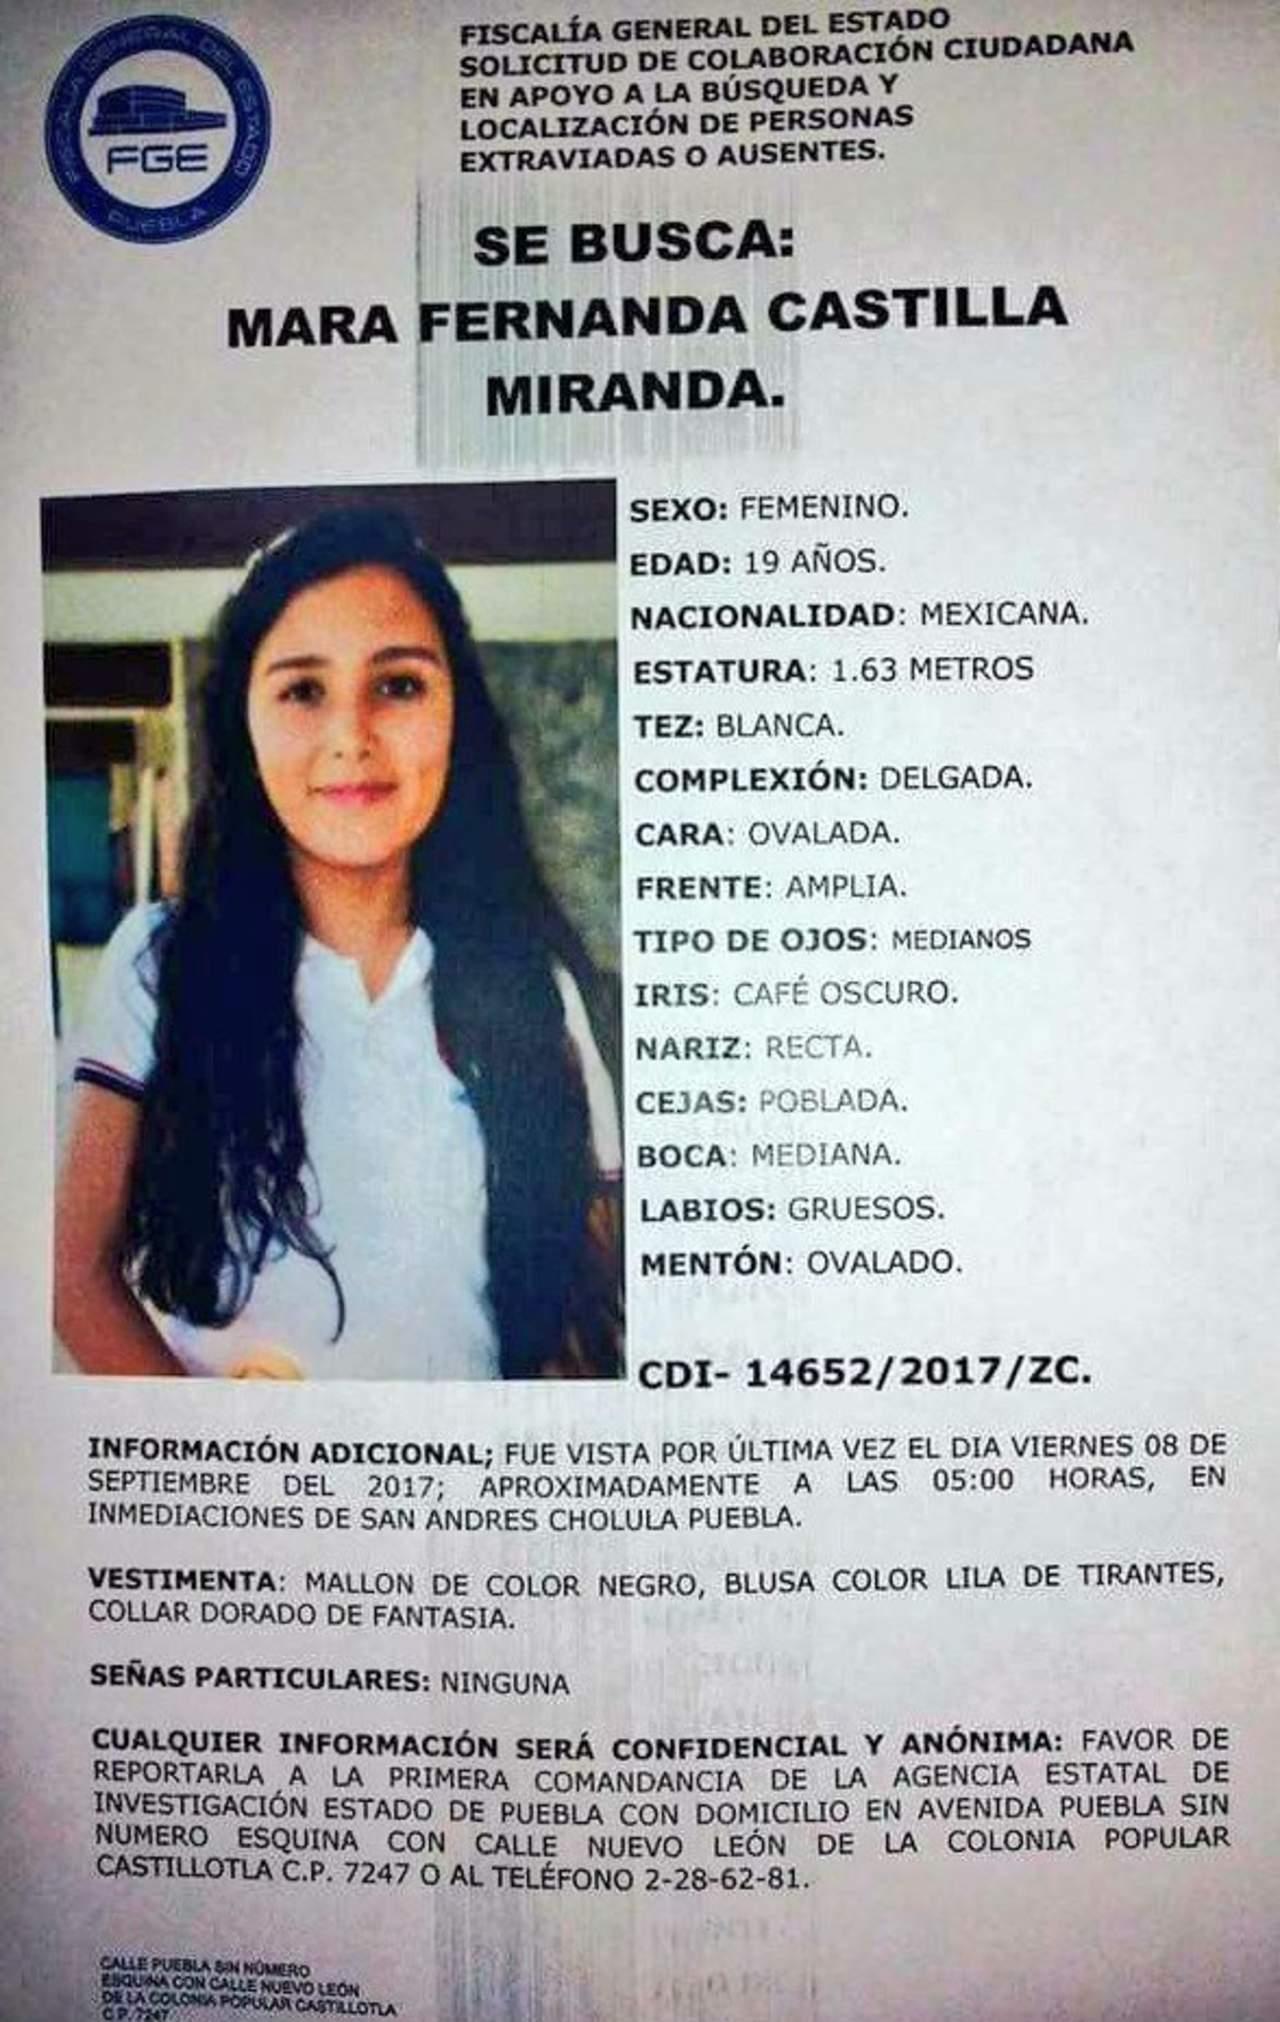 Mara Fernanda fue violada y luego estrangulada: FGE